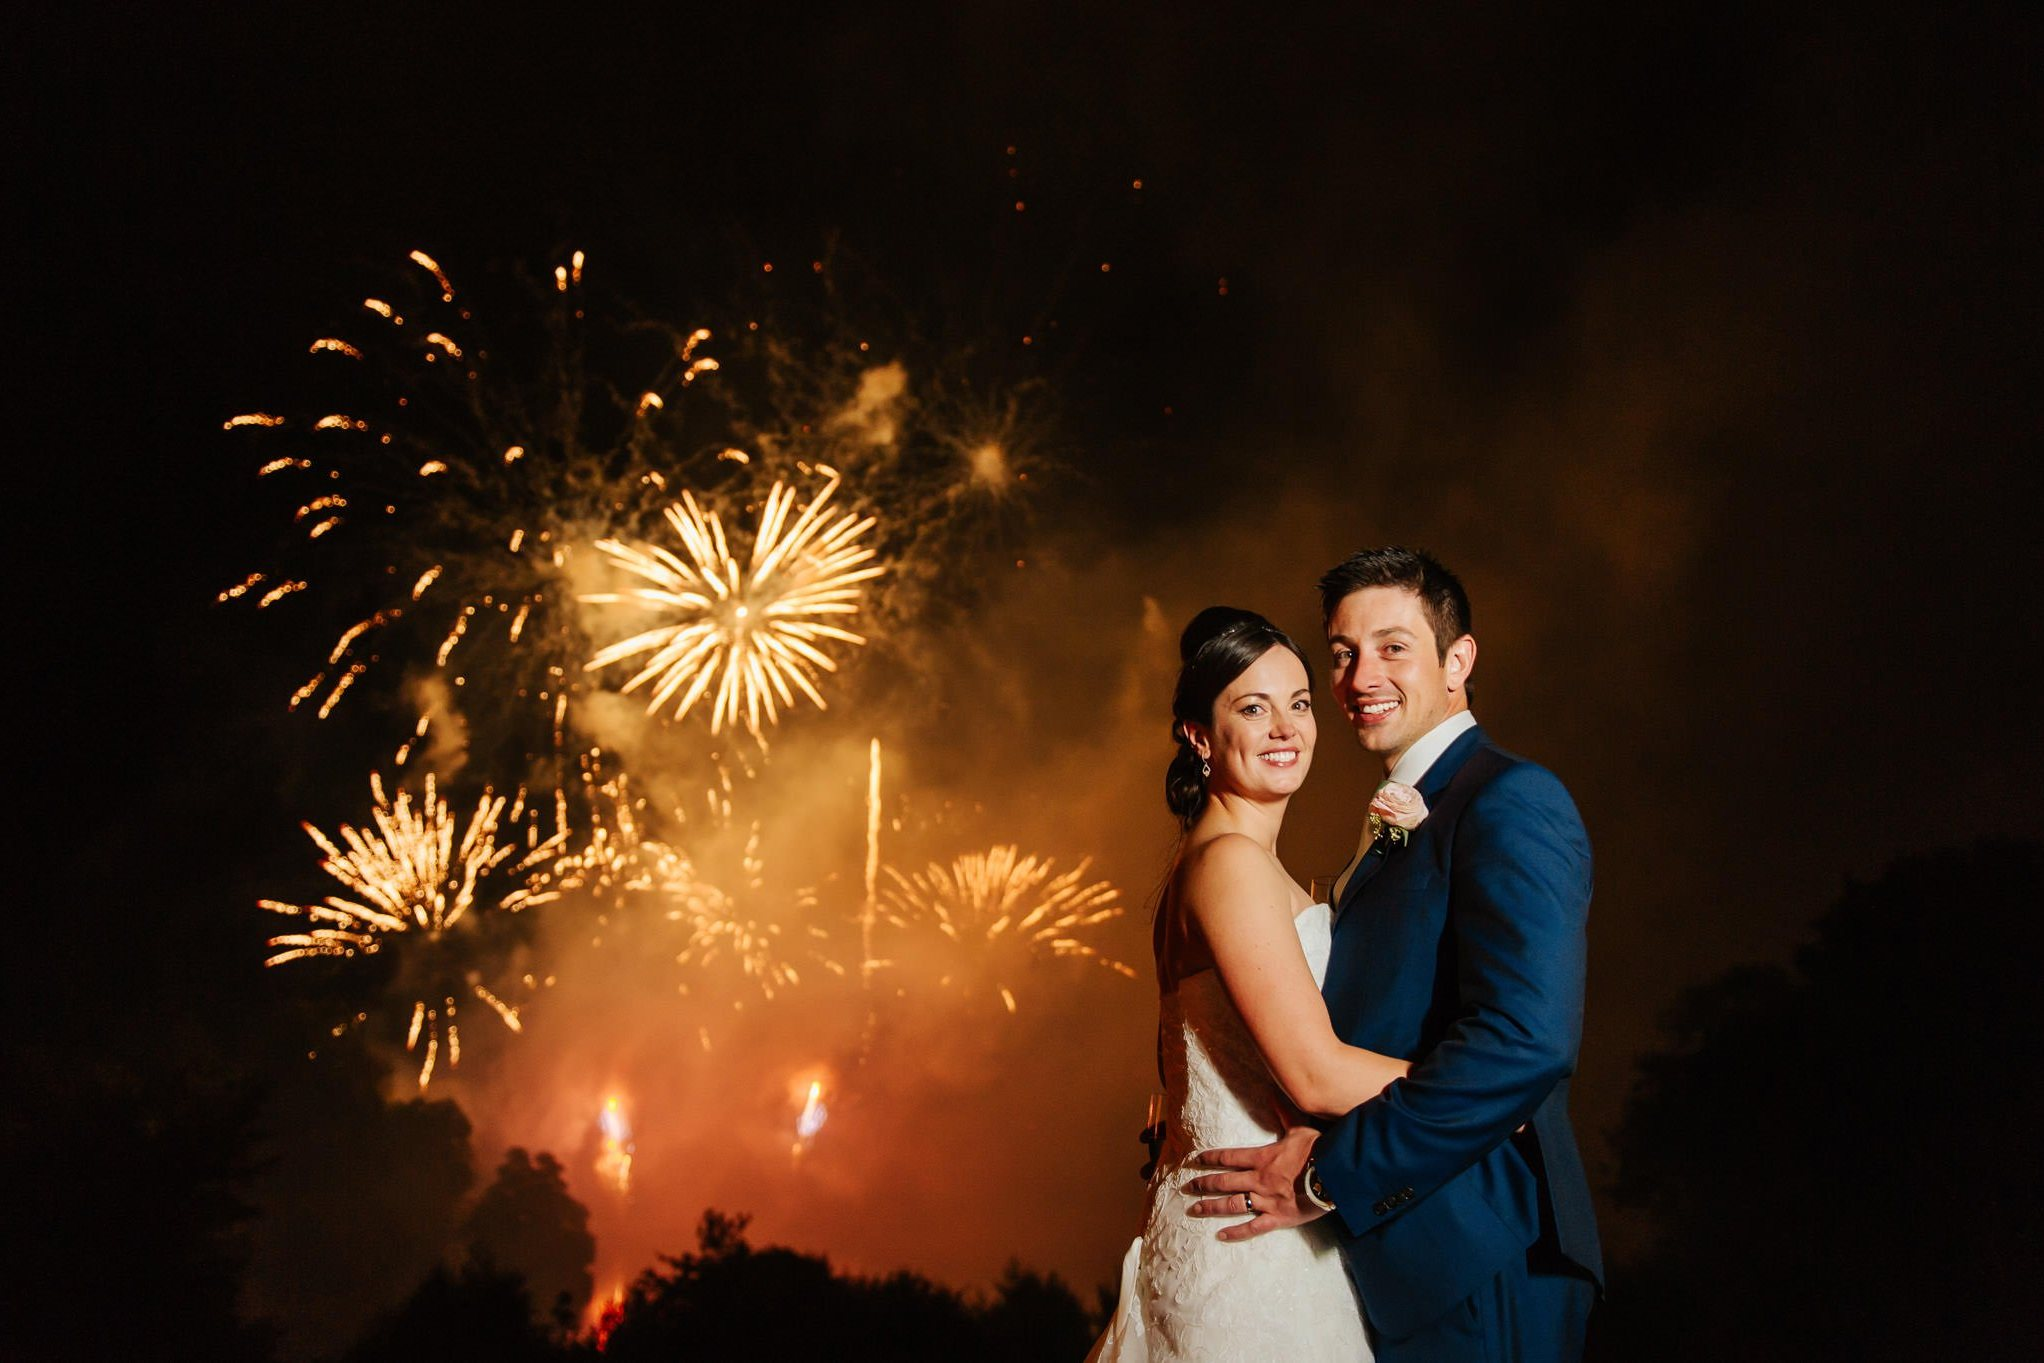 Eastnor Castle wedding photographer Herefordshire, West Midlands - Sarah + Dean 20